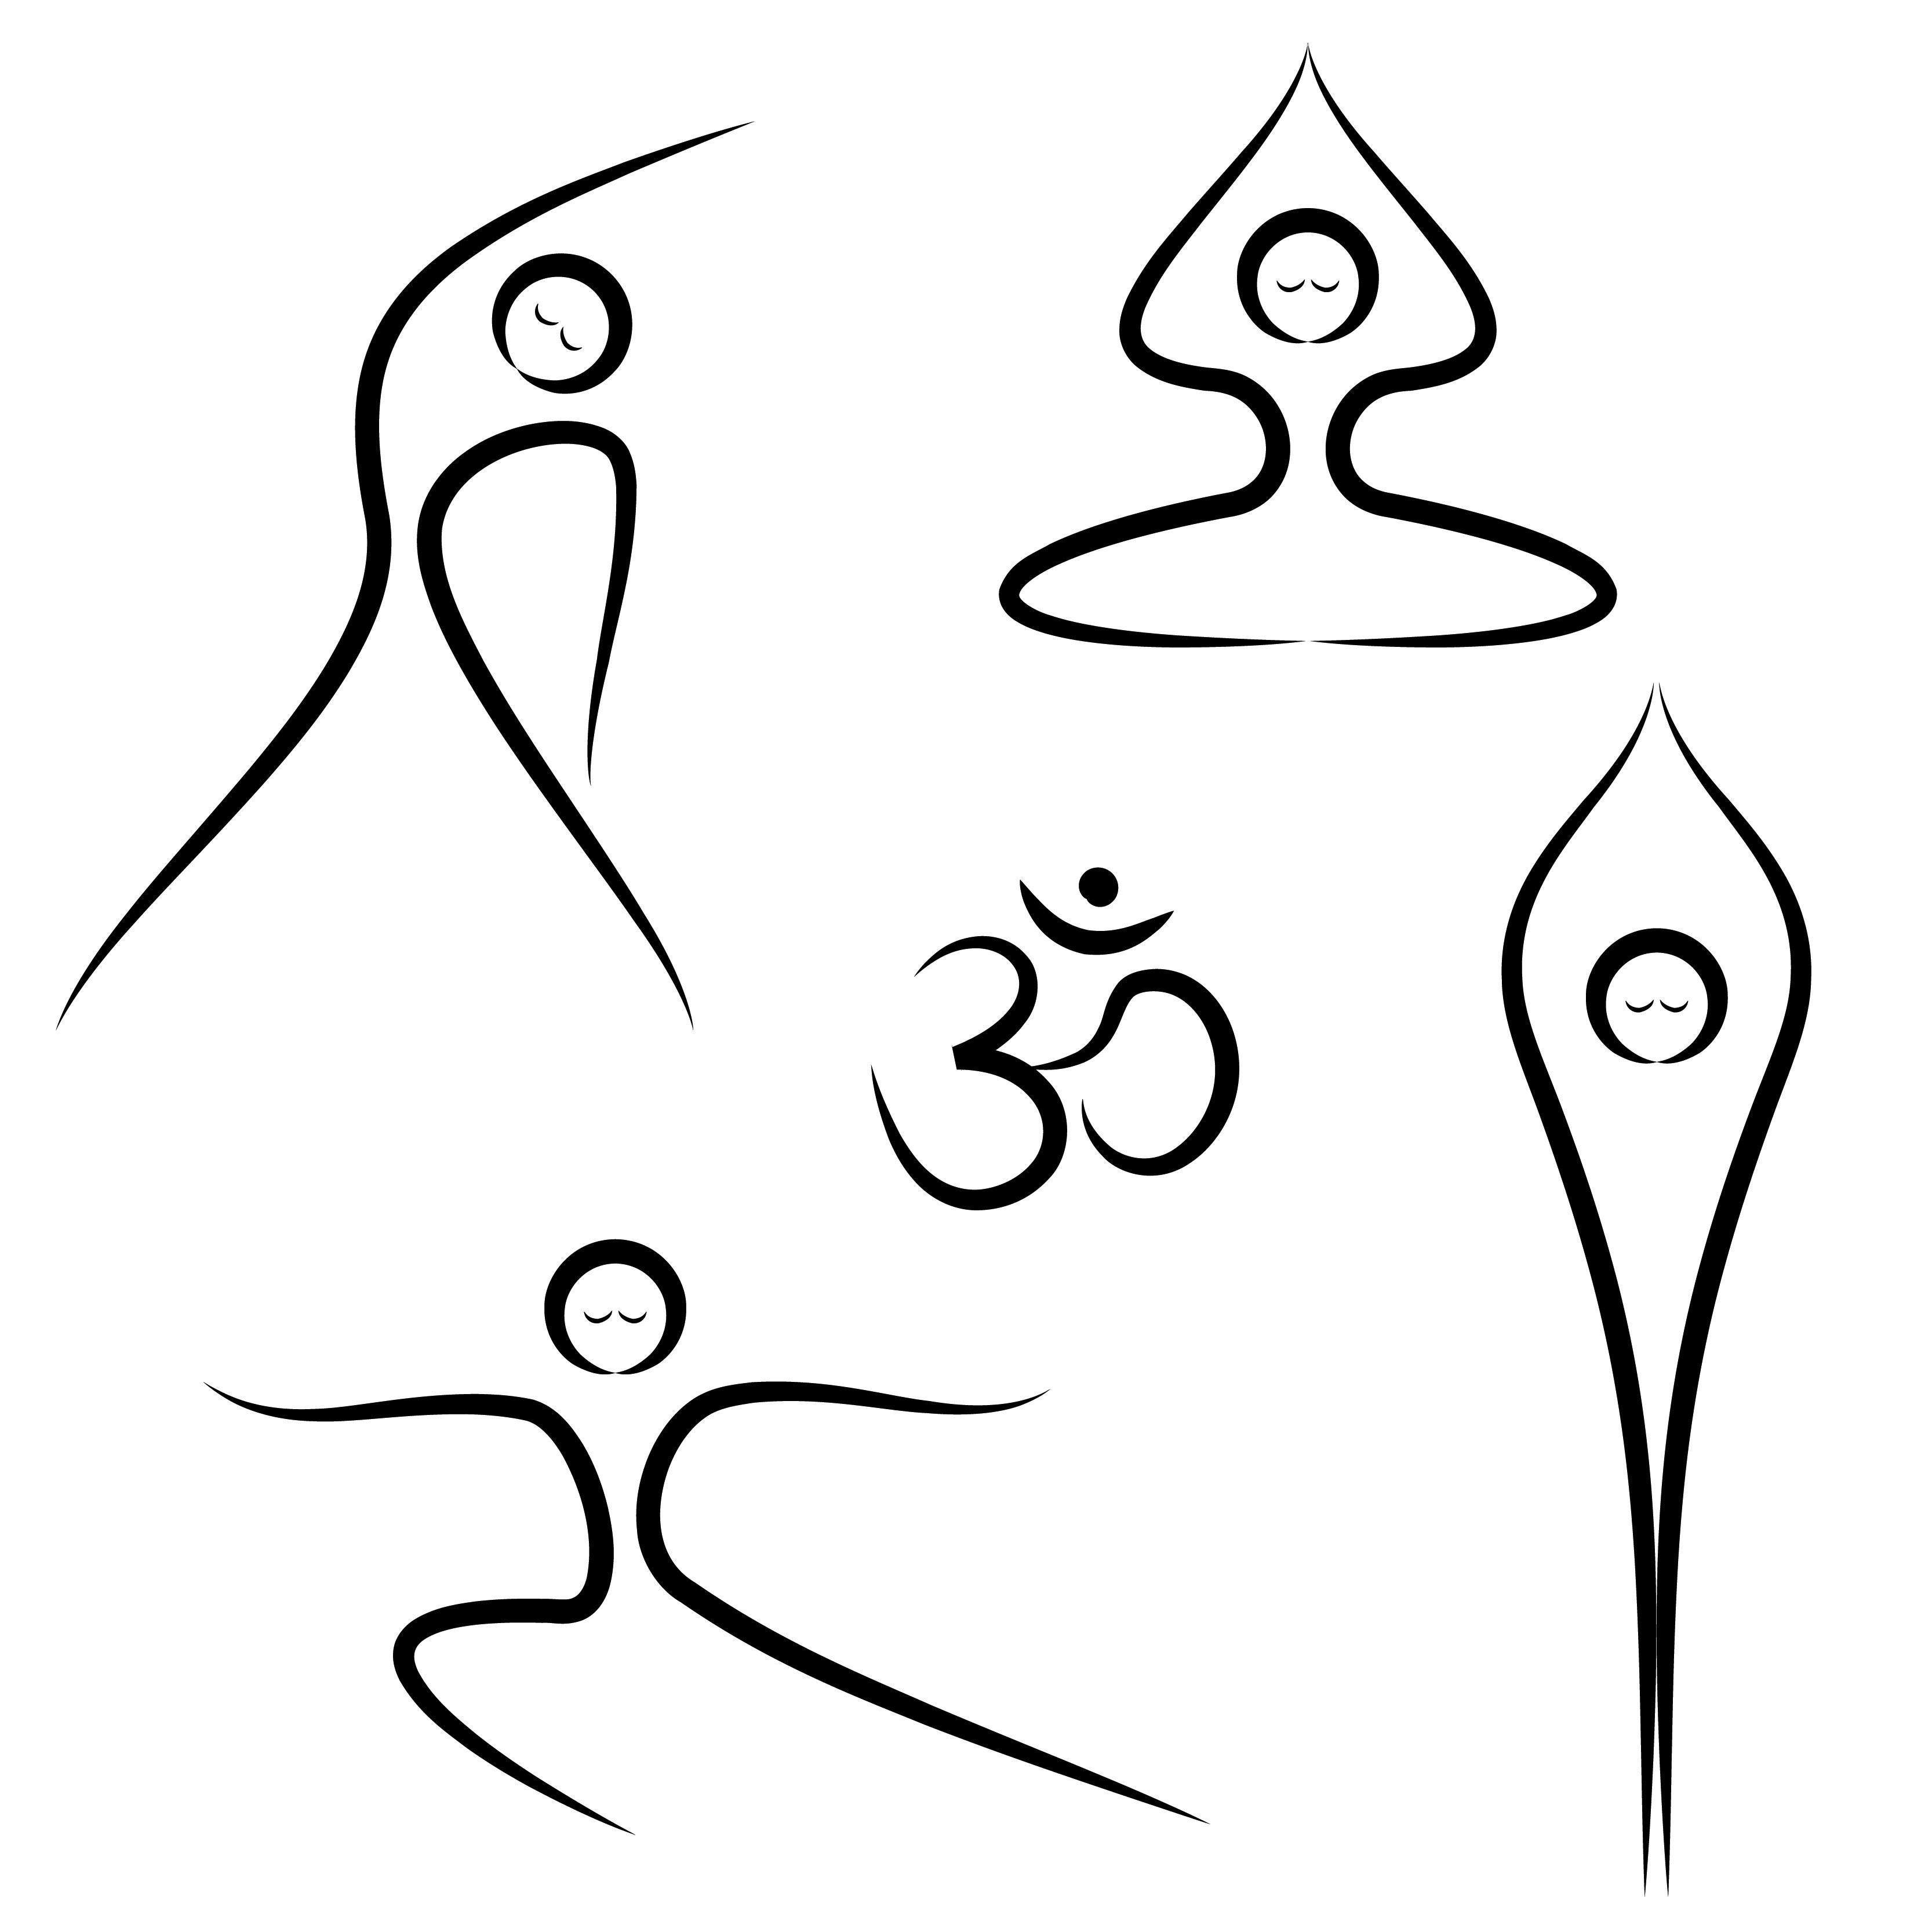 3333x3333 Four Stick Figures Doing Different Yoga Postures. Yoni Yoga Birth